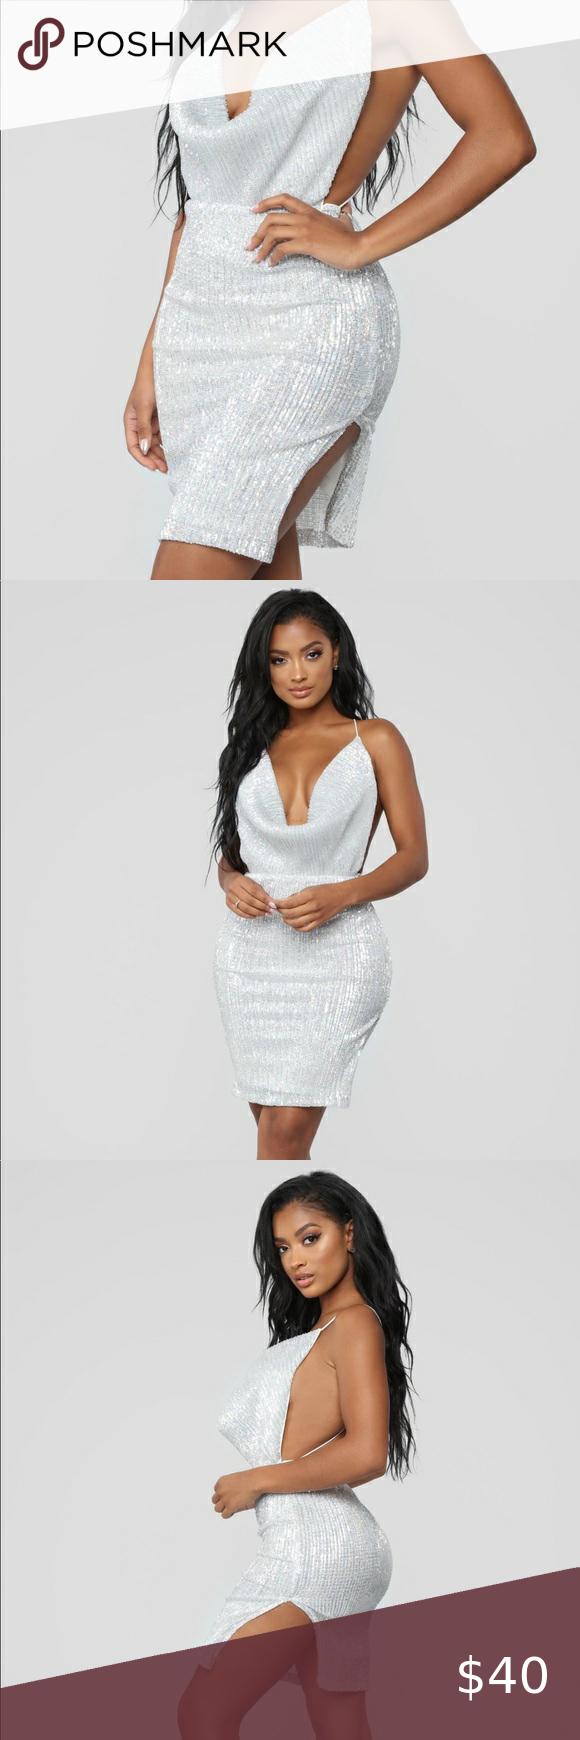 Silver Sequin Mini Dress XL in 2020 Sequin mini dress